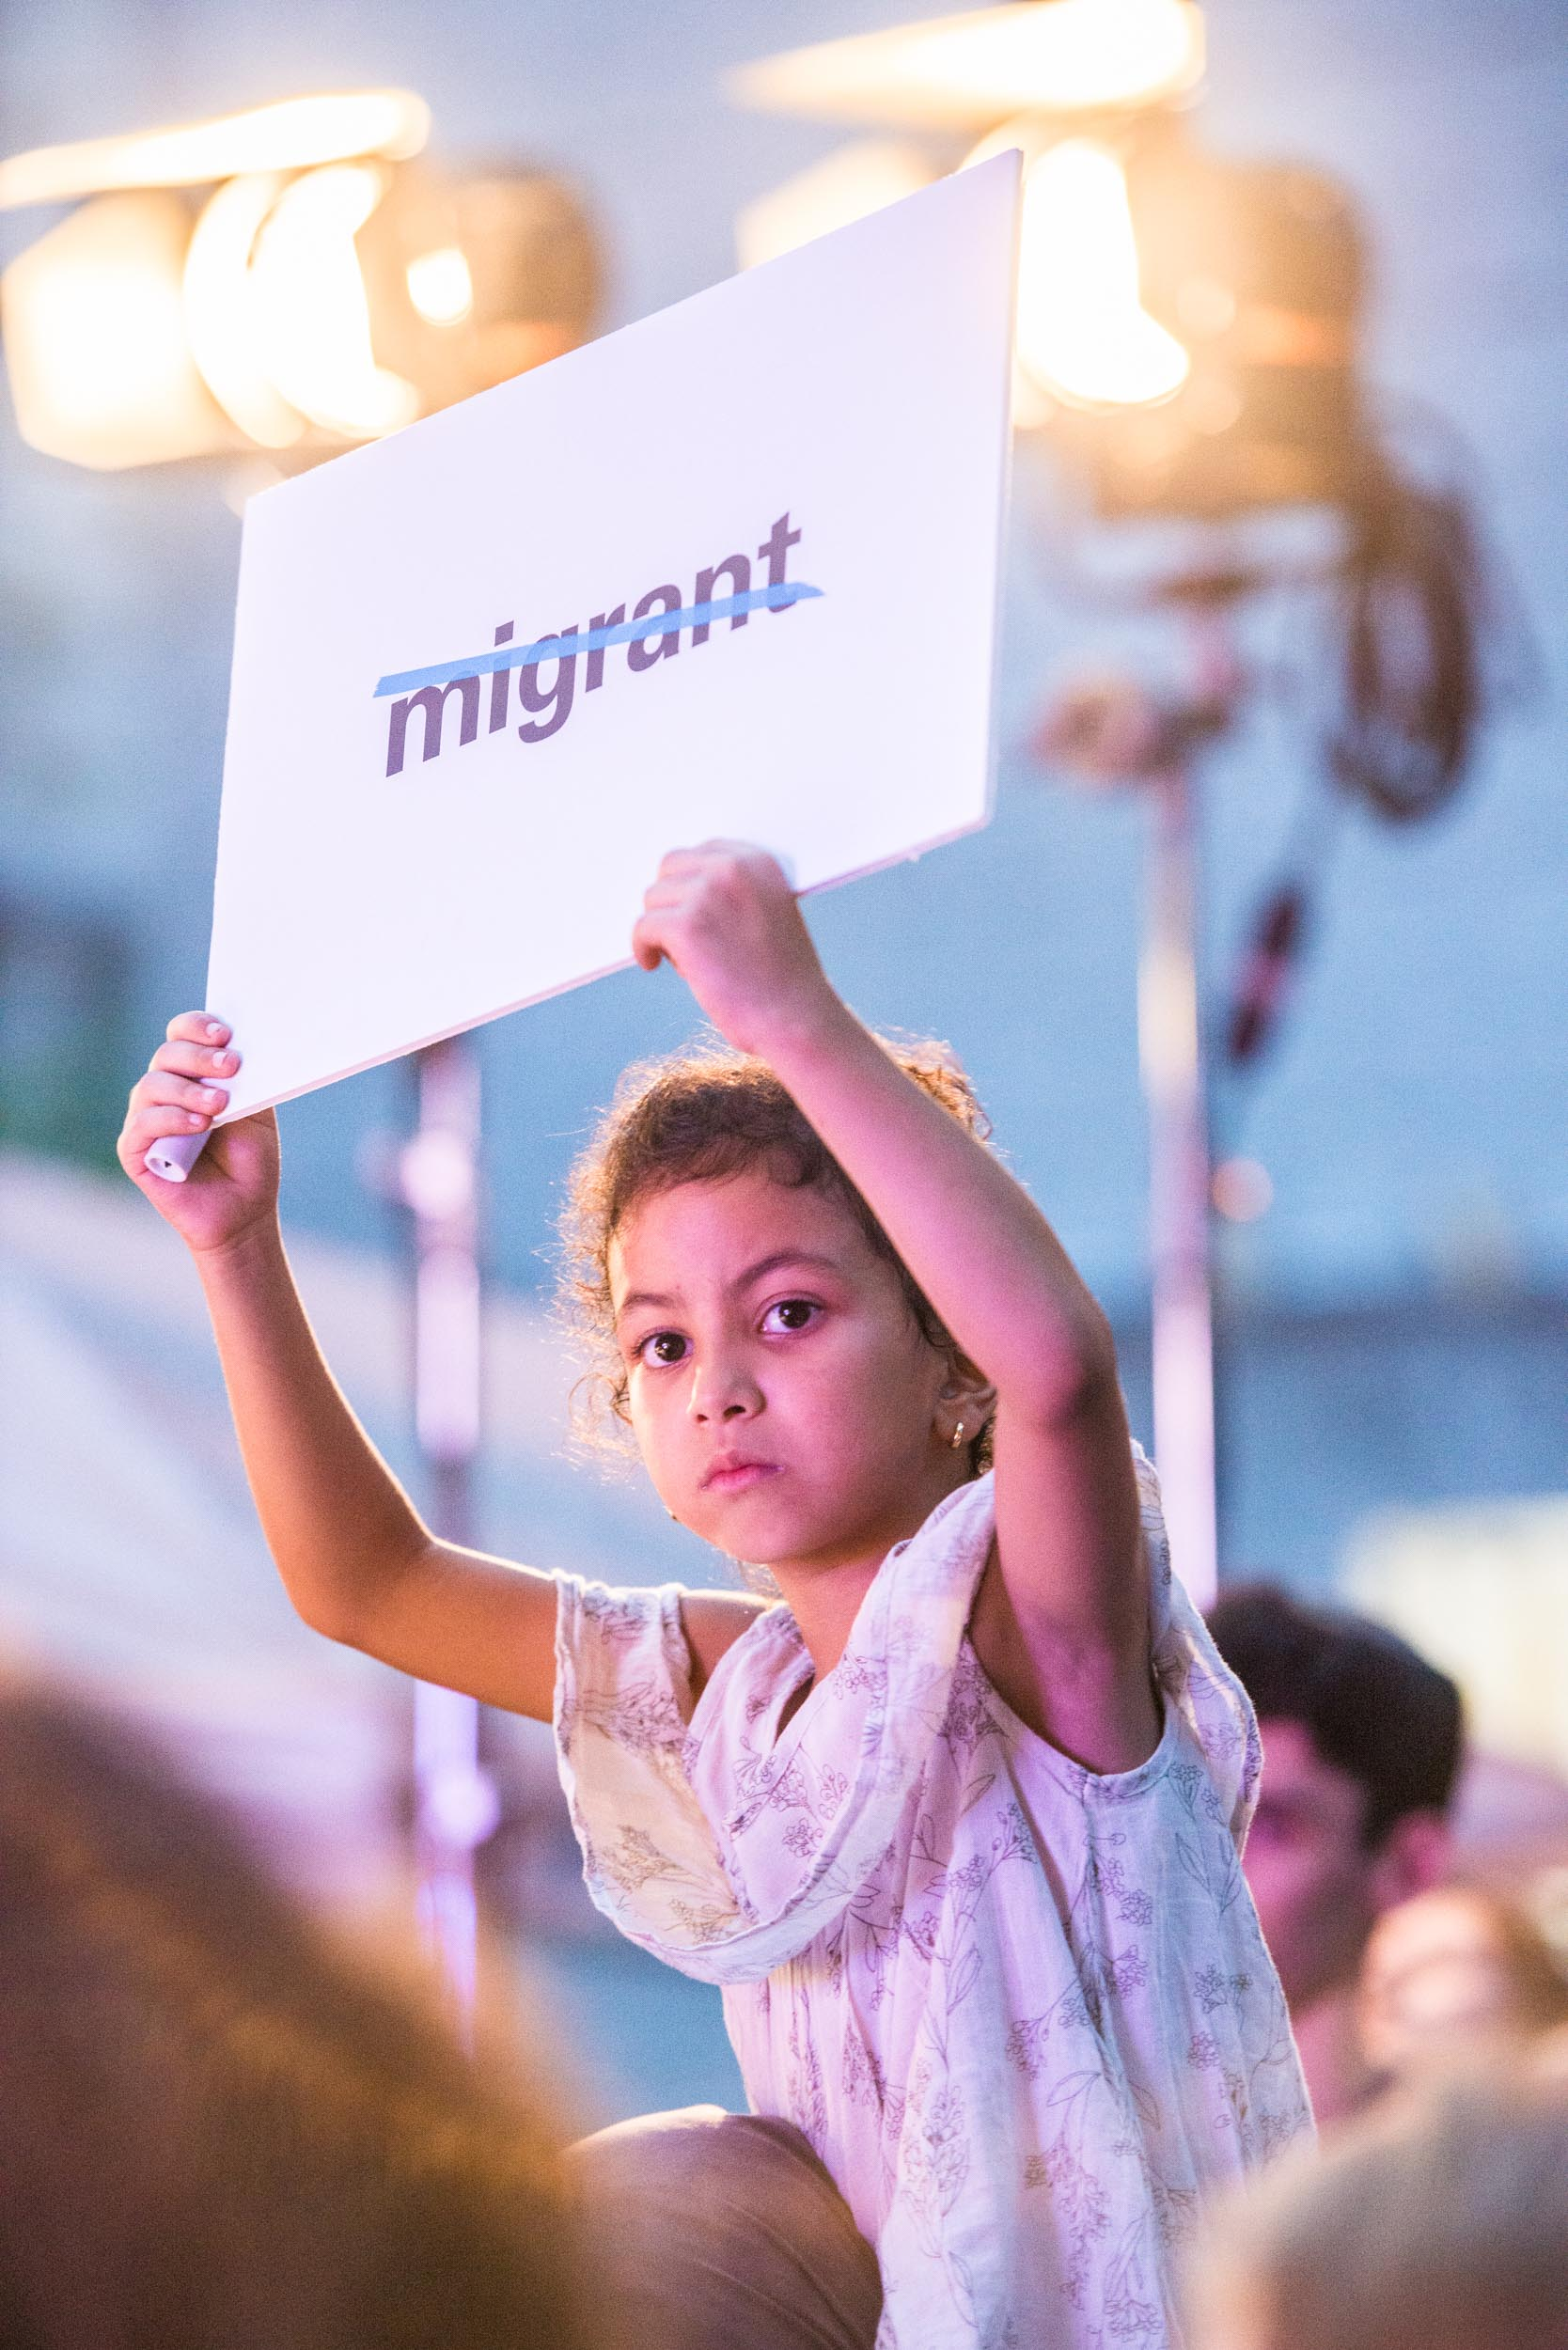 Migrant child - Current events - Photo credit Nicola Bailey.jpg